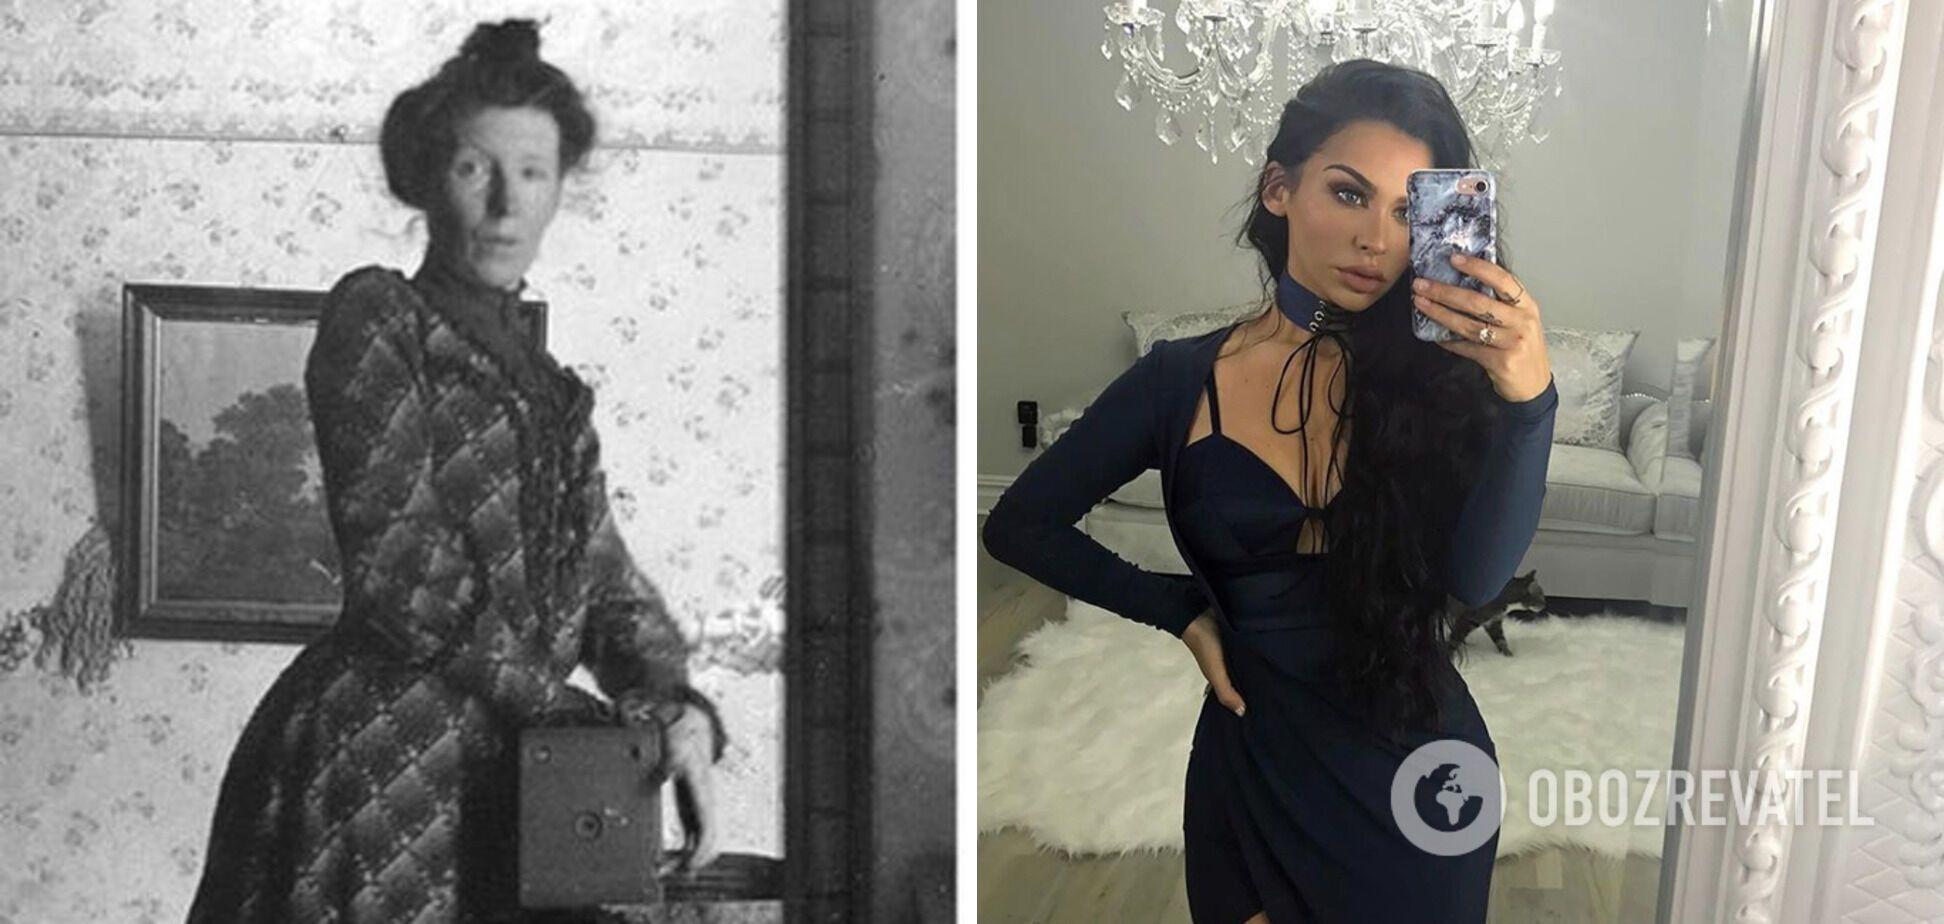 Мода на селфи в зеркале появилась не в XXI веке